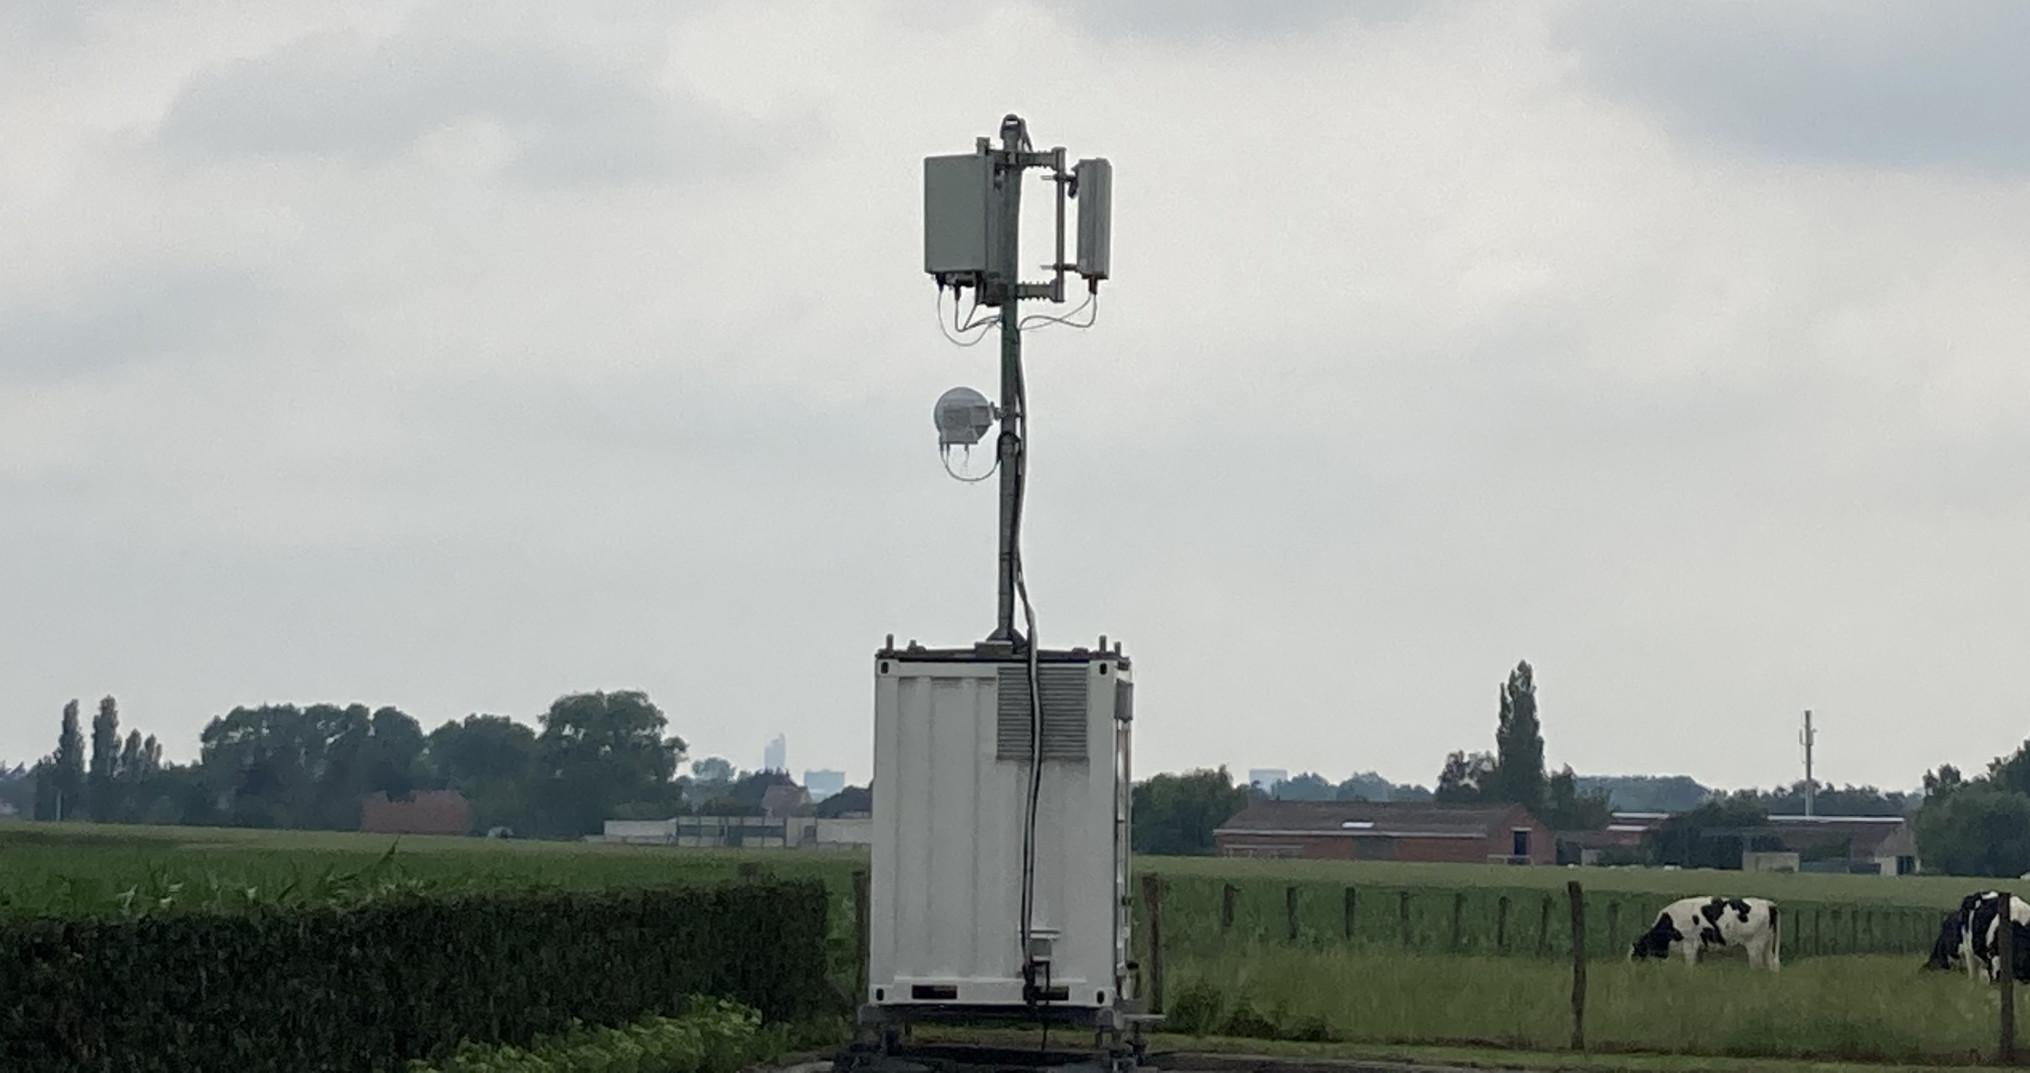 mobiele zendmast proximus 5G_Matthias Vanheerentals